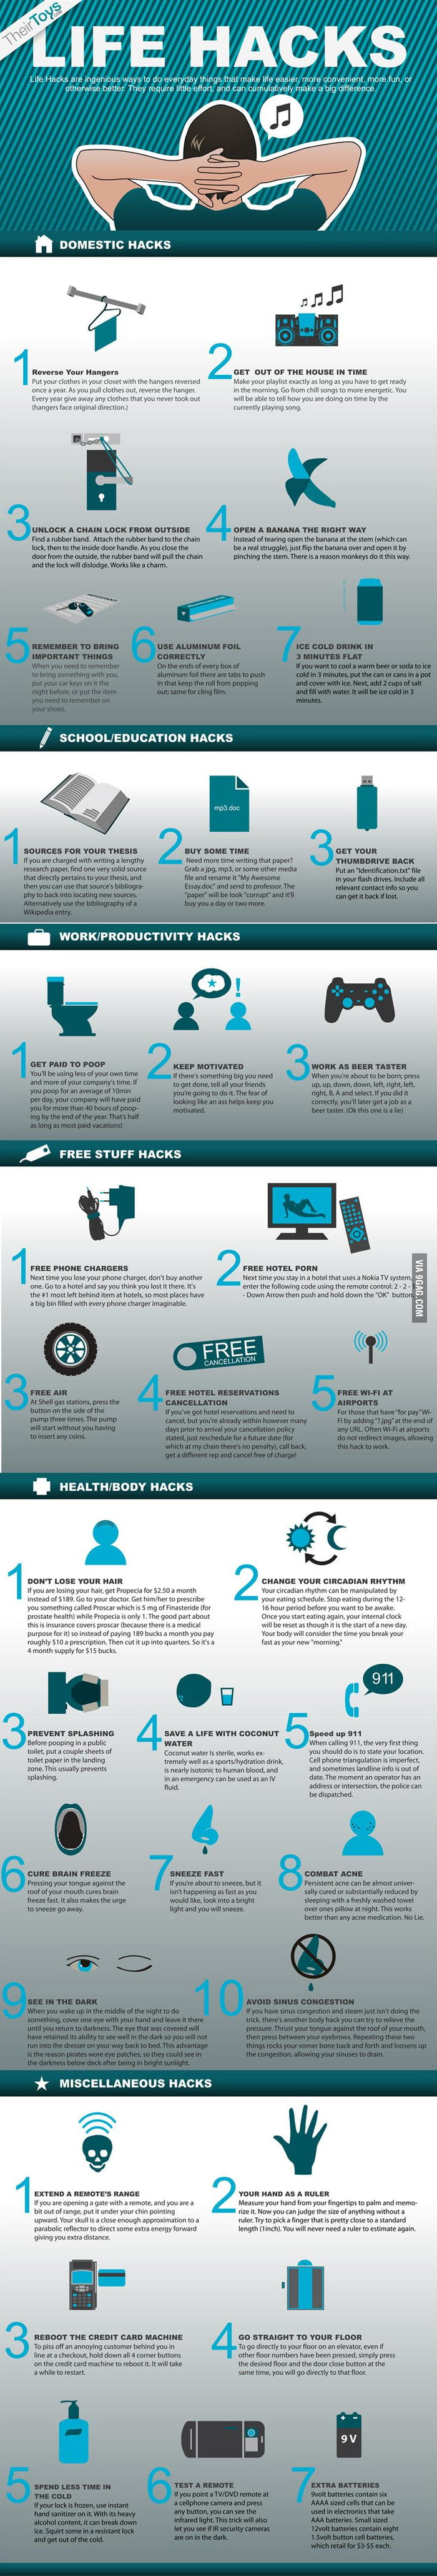 Life hacks 2.0